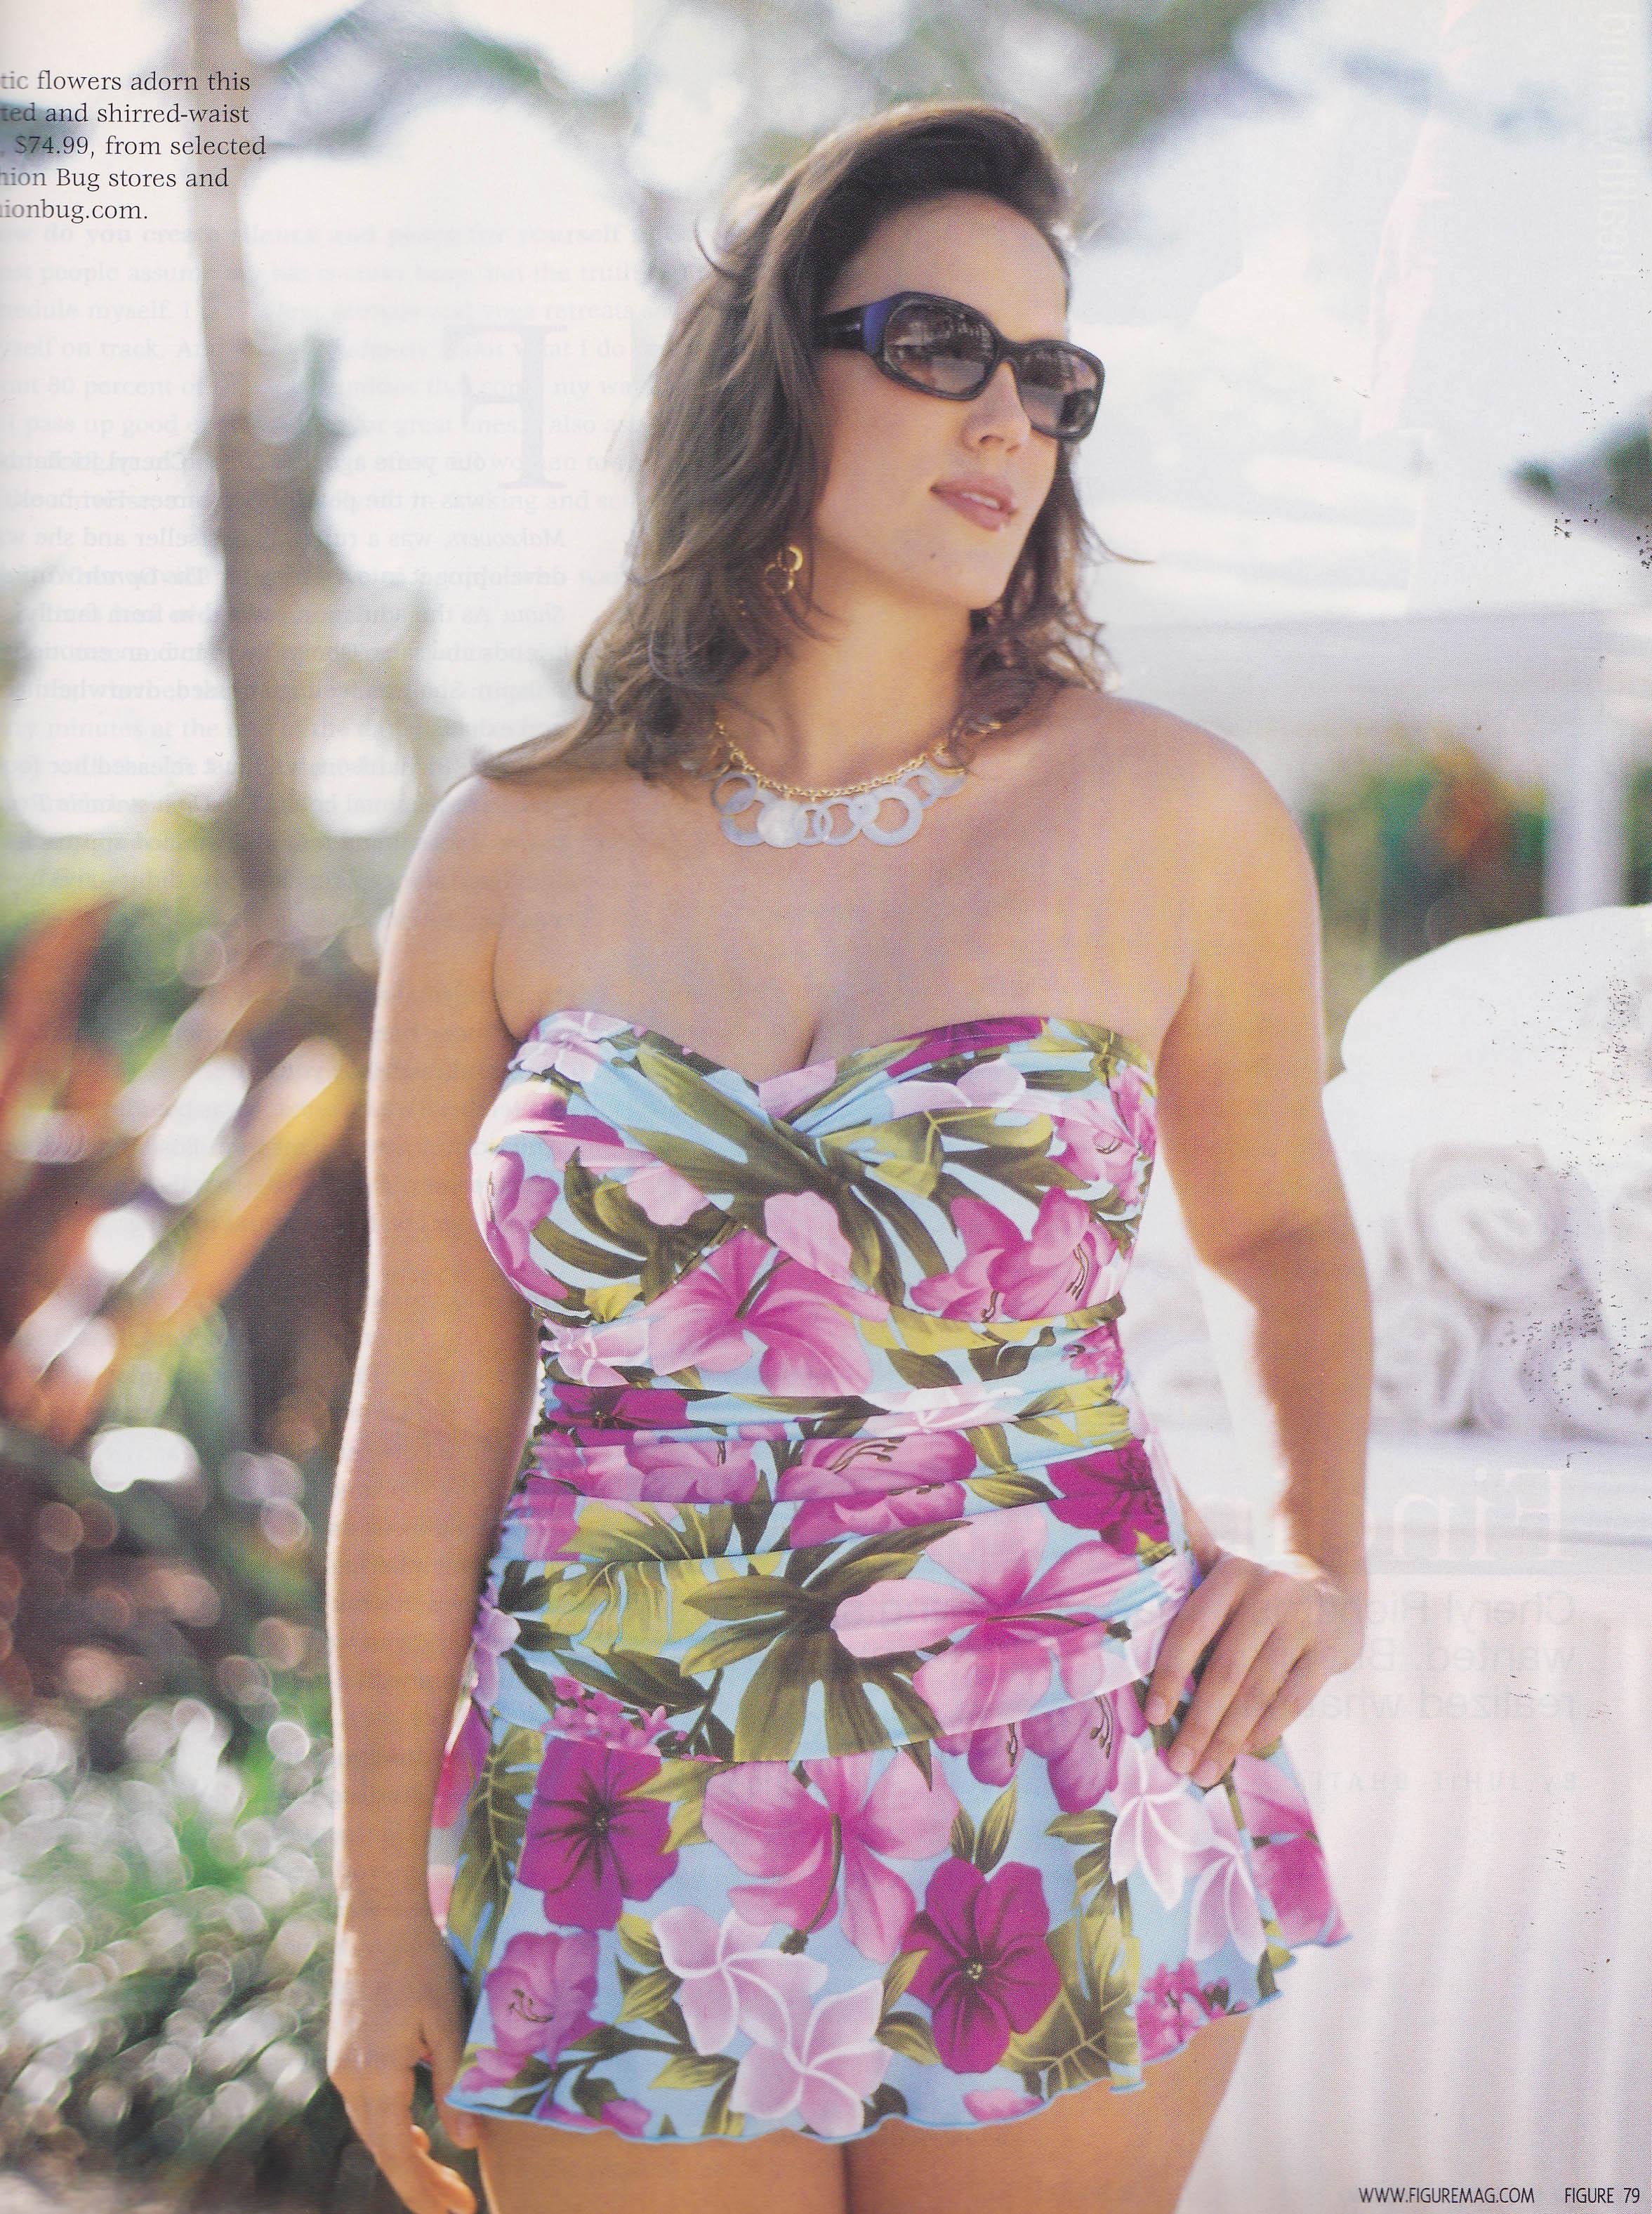 May 2006 Figure Magazine